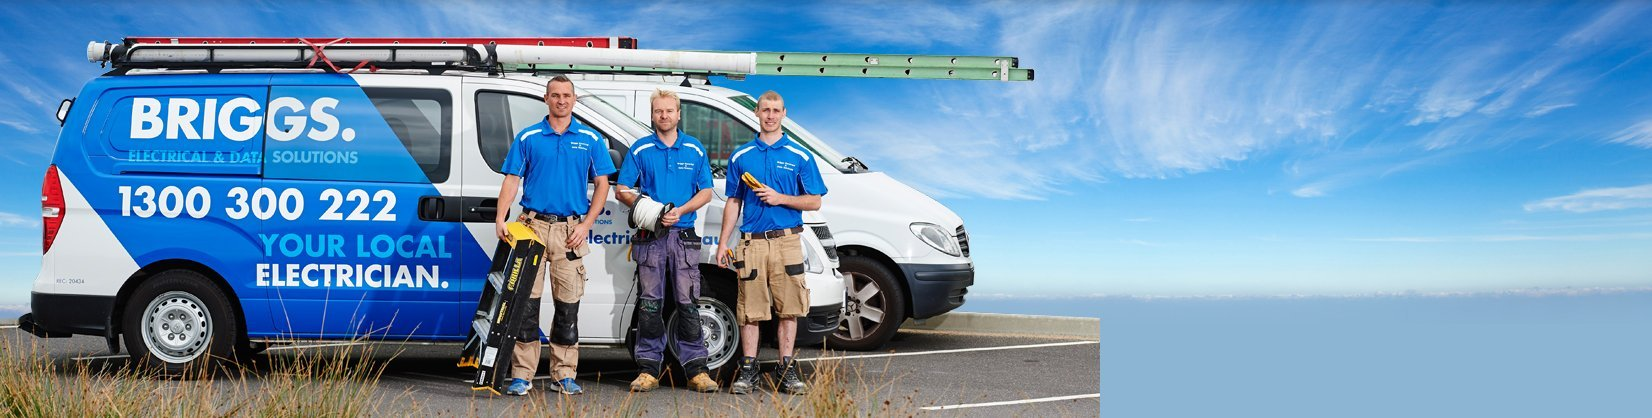 Briggs Emergency Electrician Melbourne